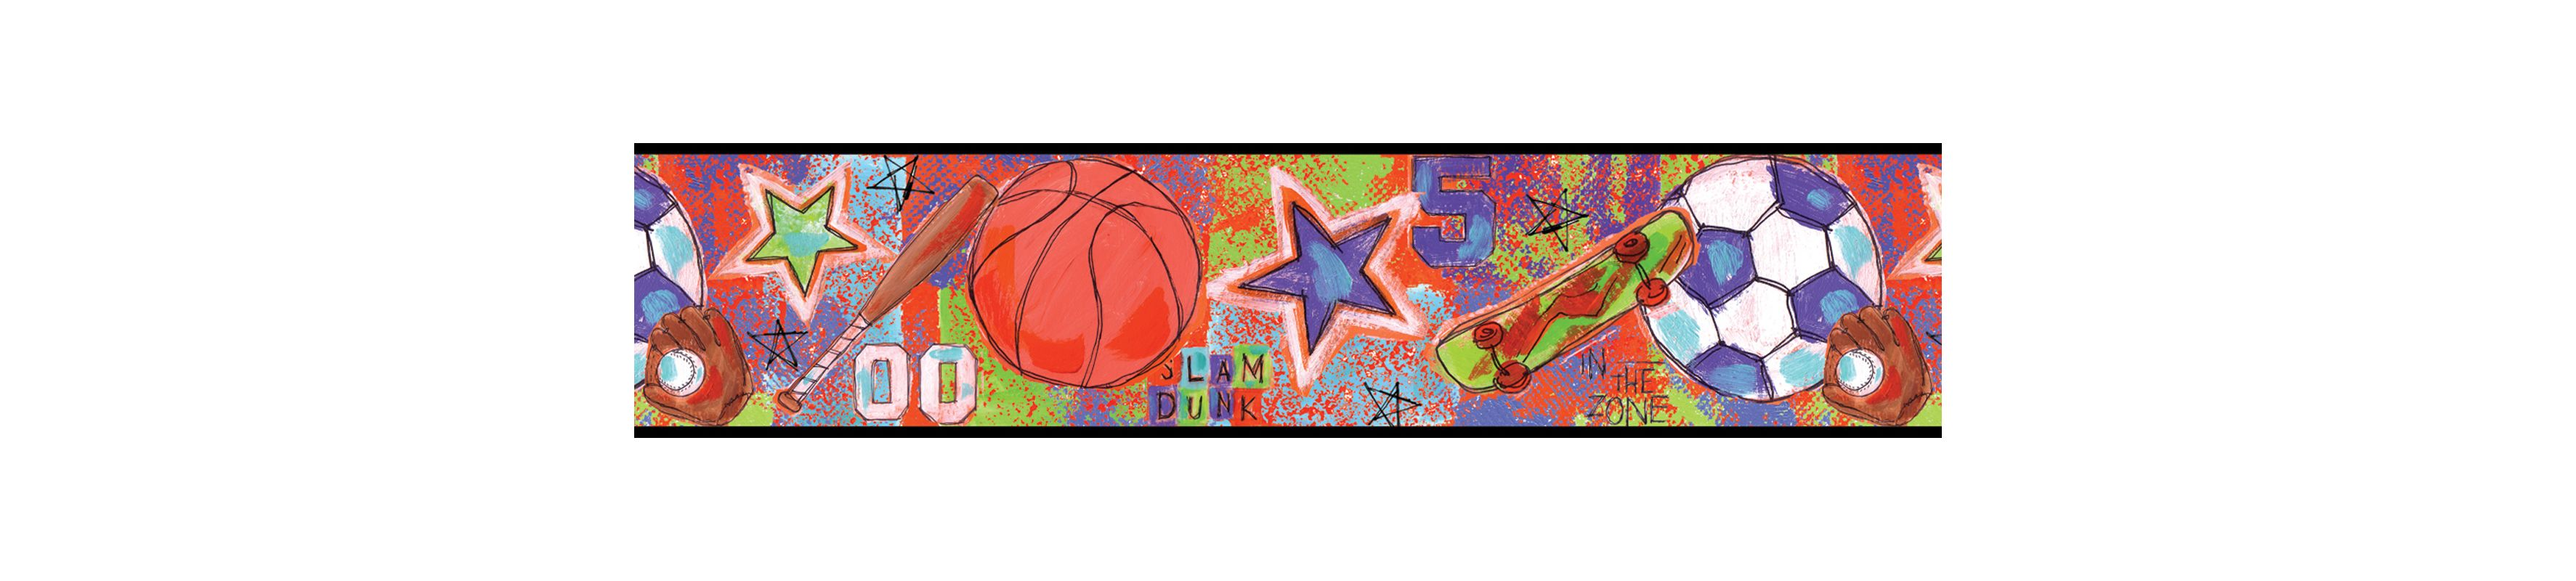 brewster wallpaper borders upc - photo #21